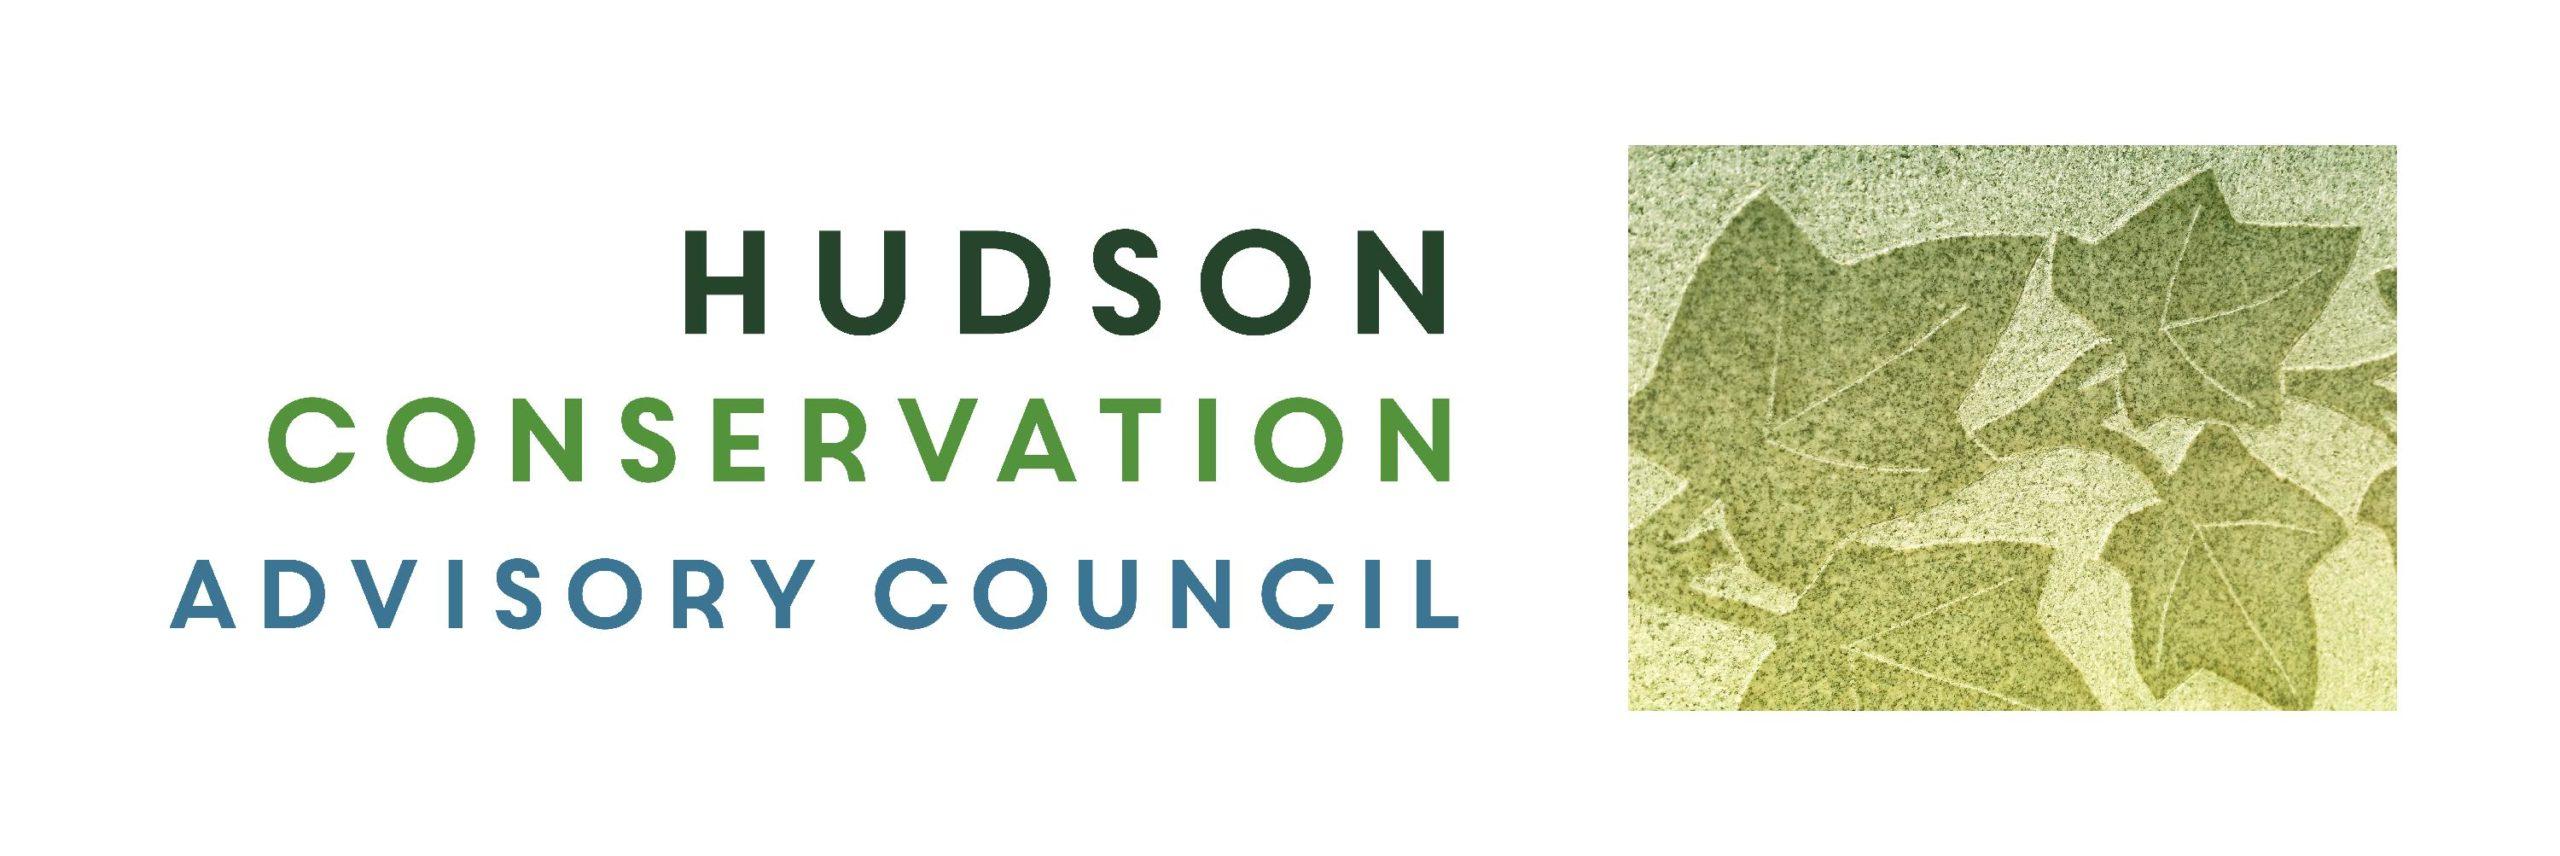 Hudson Conservation Advisory Council